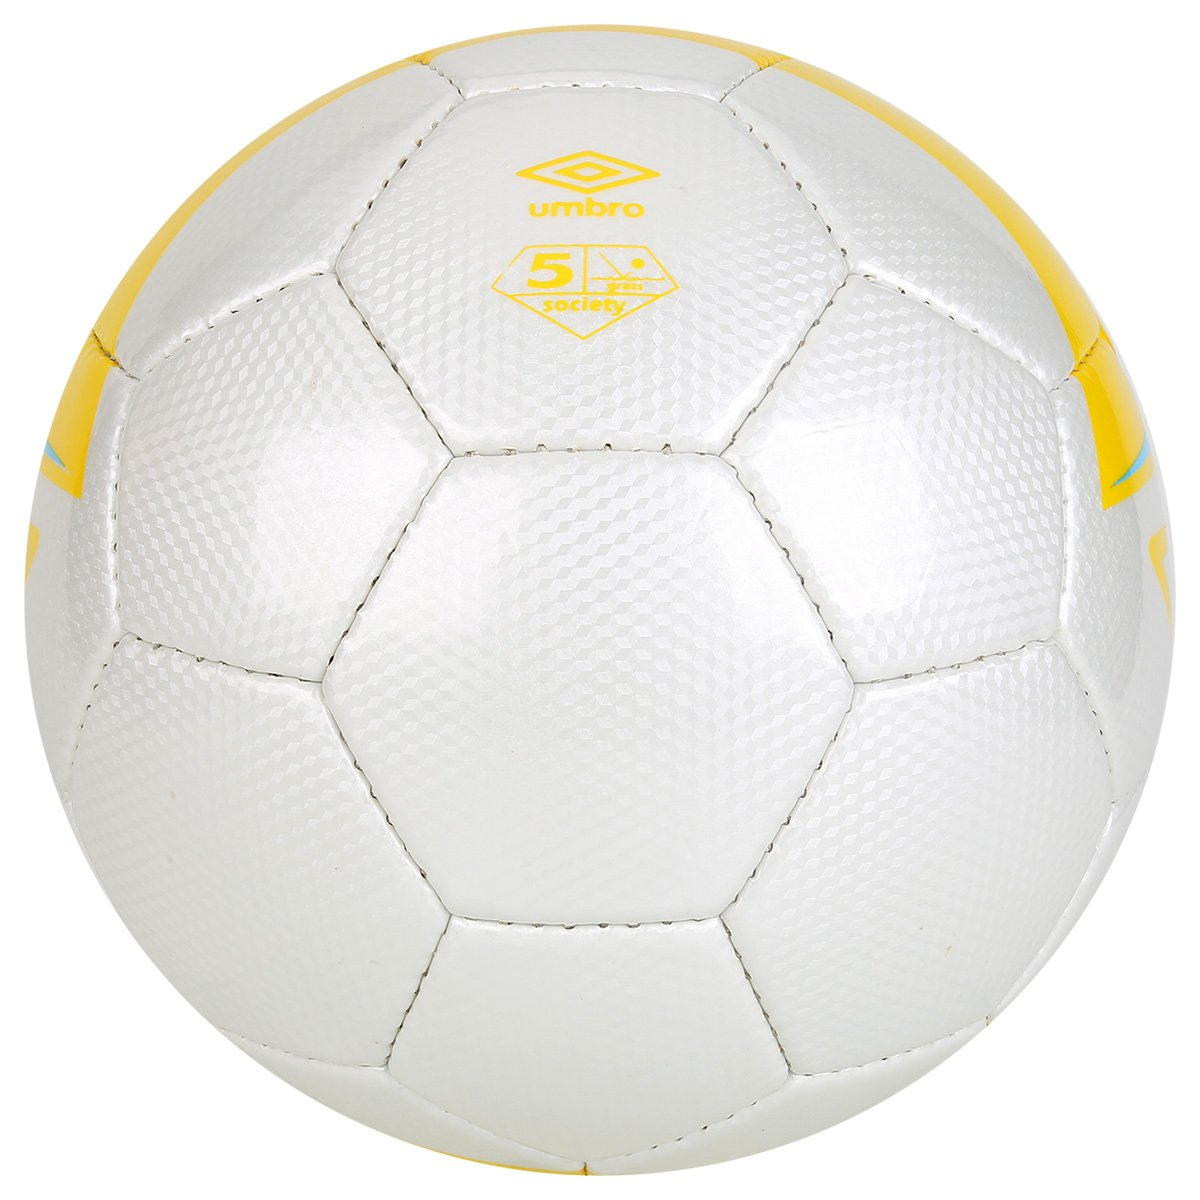 Bola Futebol Umbro Medusae Society  Bola Futebol Umbro Medusae Society b5baa1add6ed1